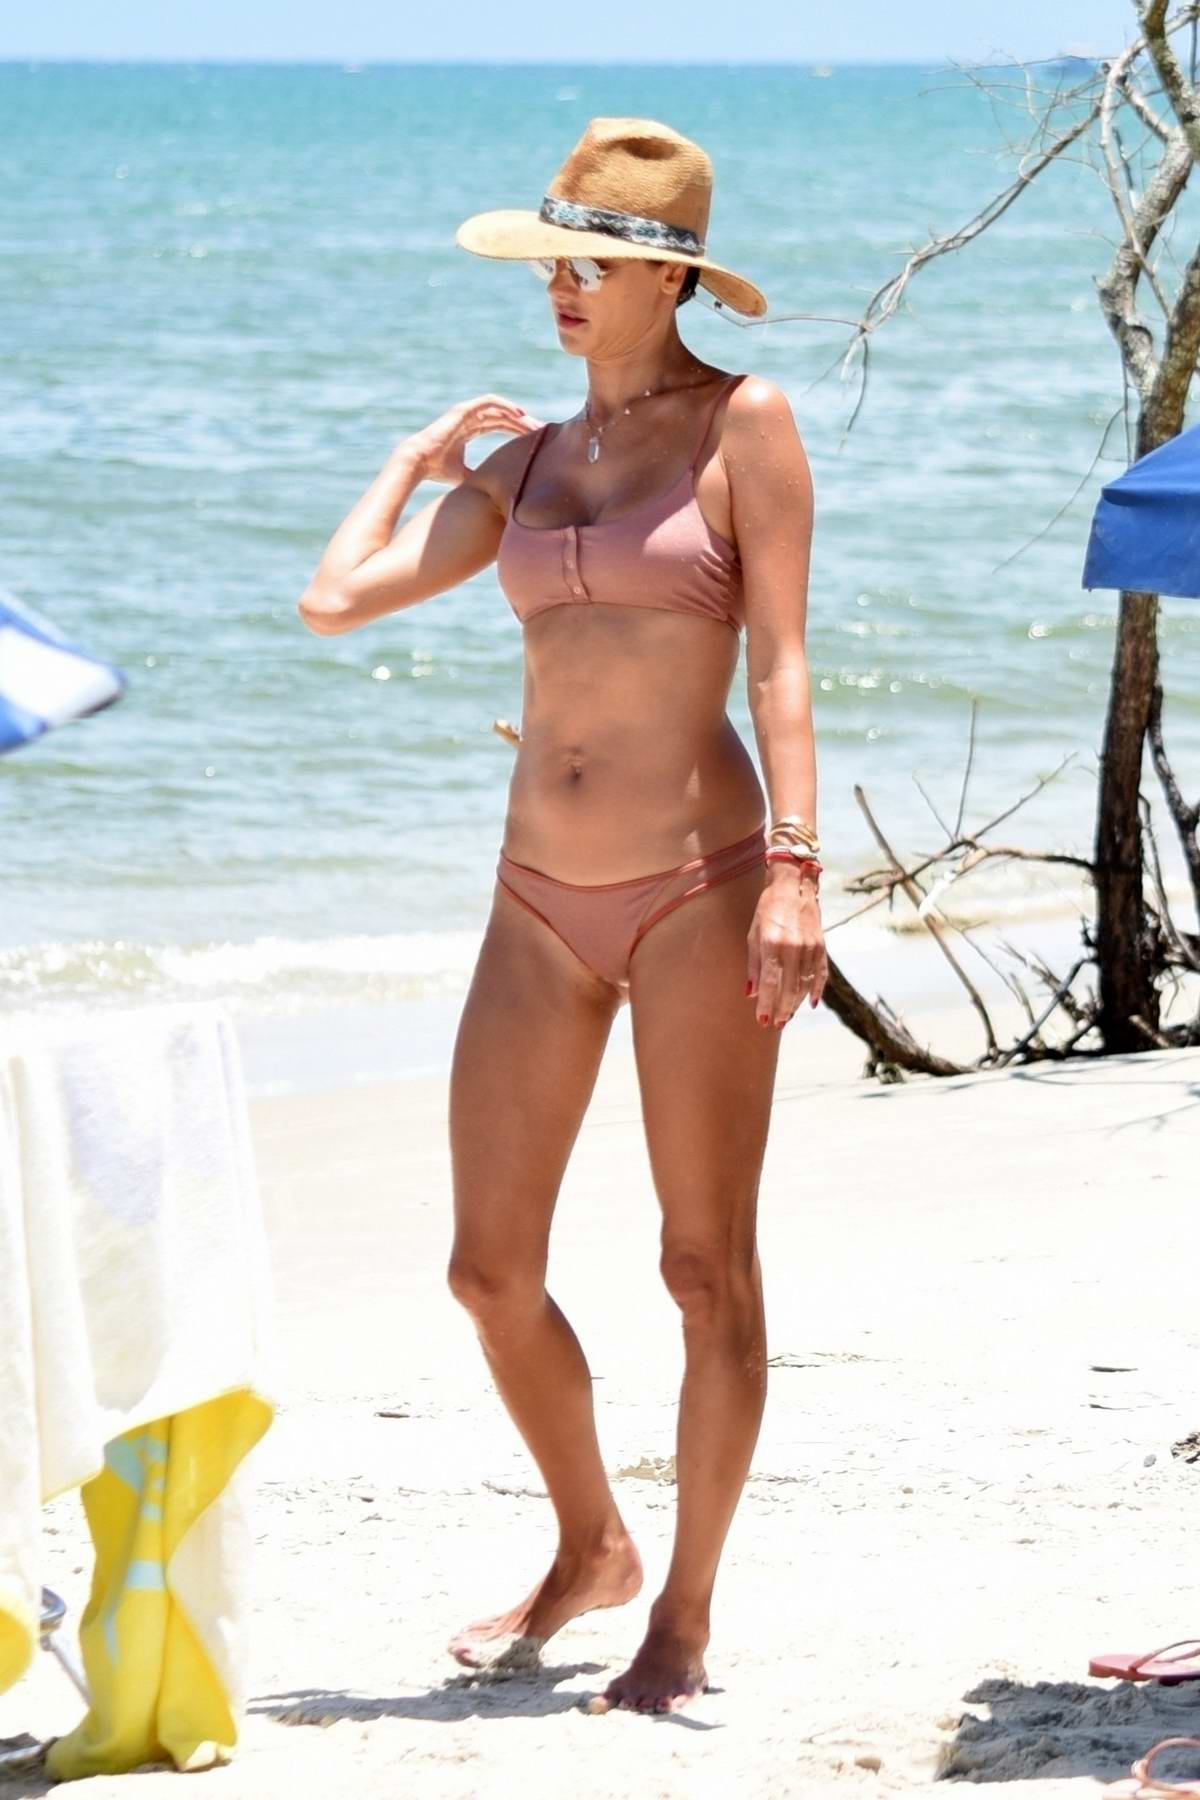 Alessandra Ambrosio sports a pink bikini as she enjoys another beach day in Santa Catarina, Brazil